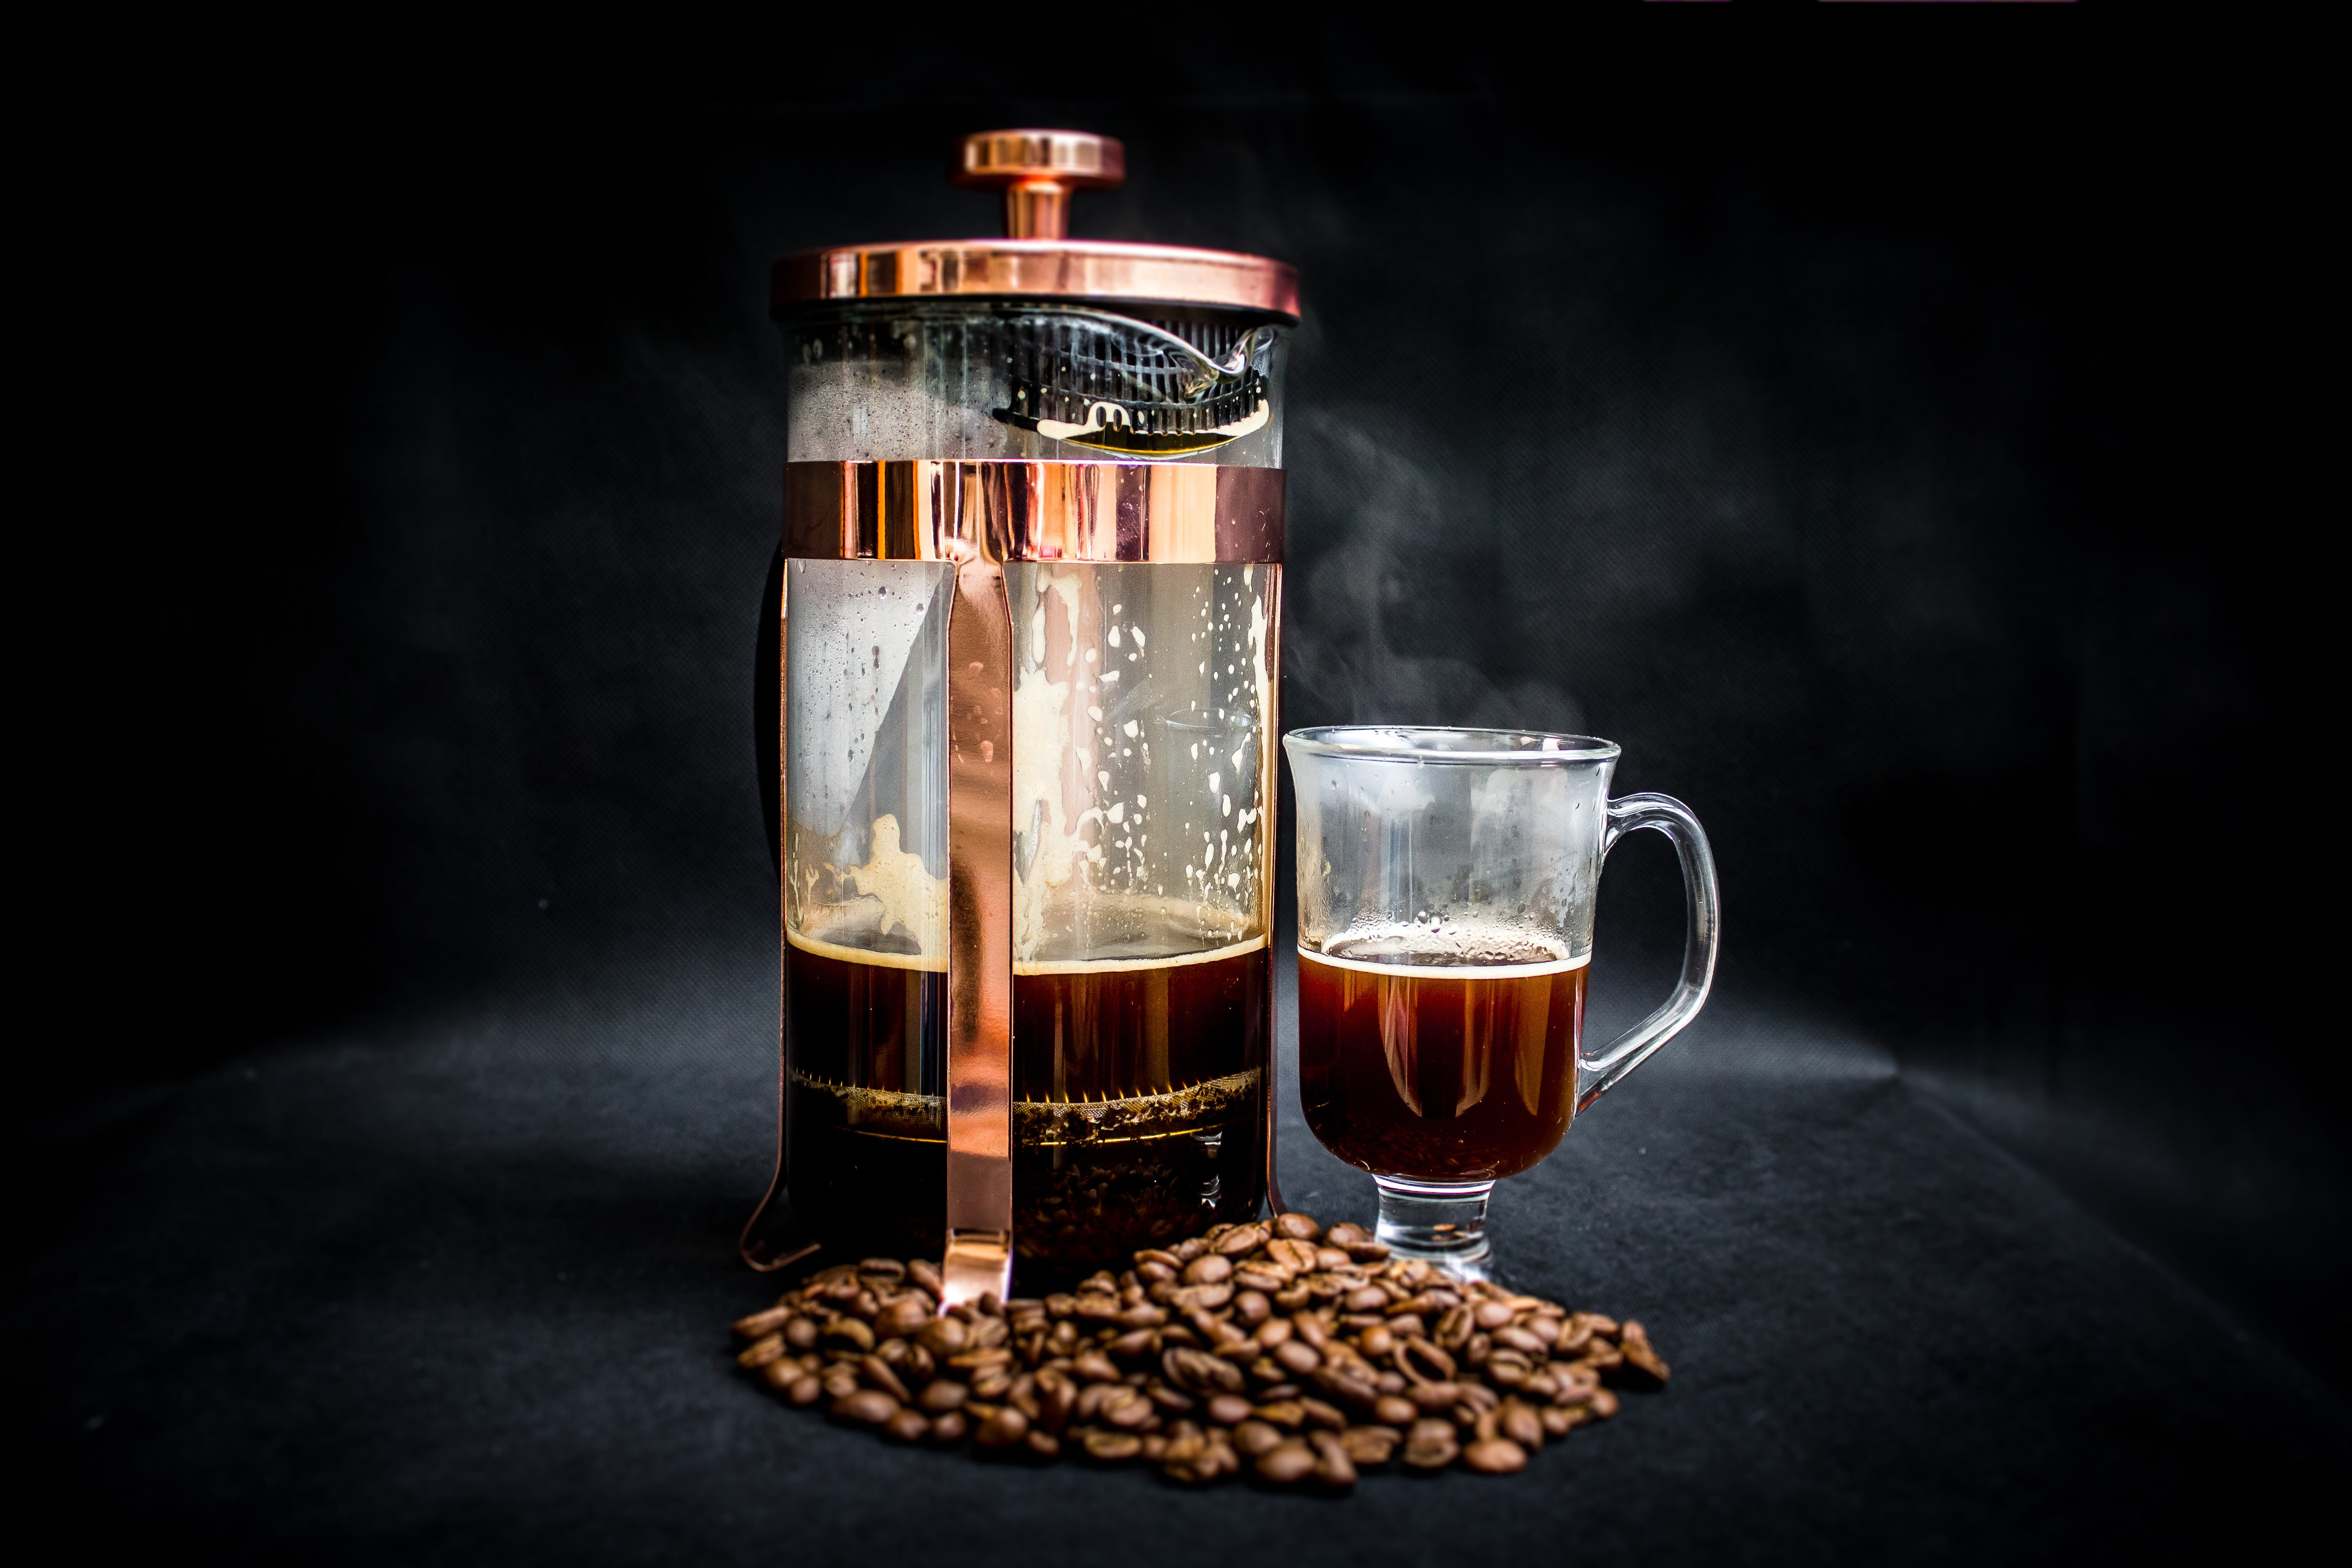 Kostenloses Stock Foto zu aromatisch, becher, gebrühter kaffee, getränk